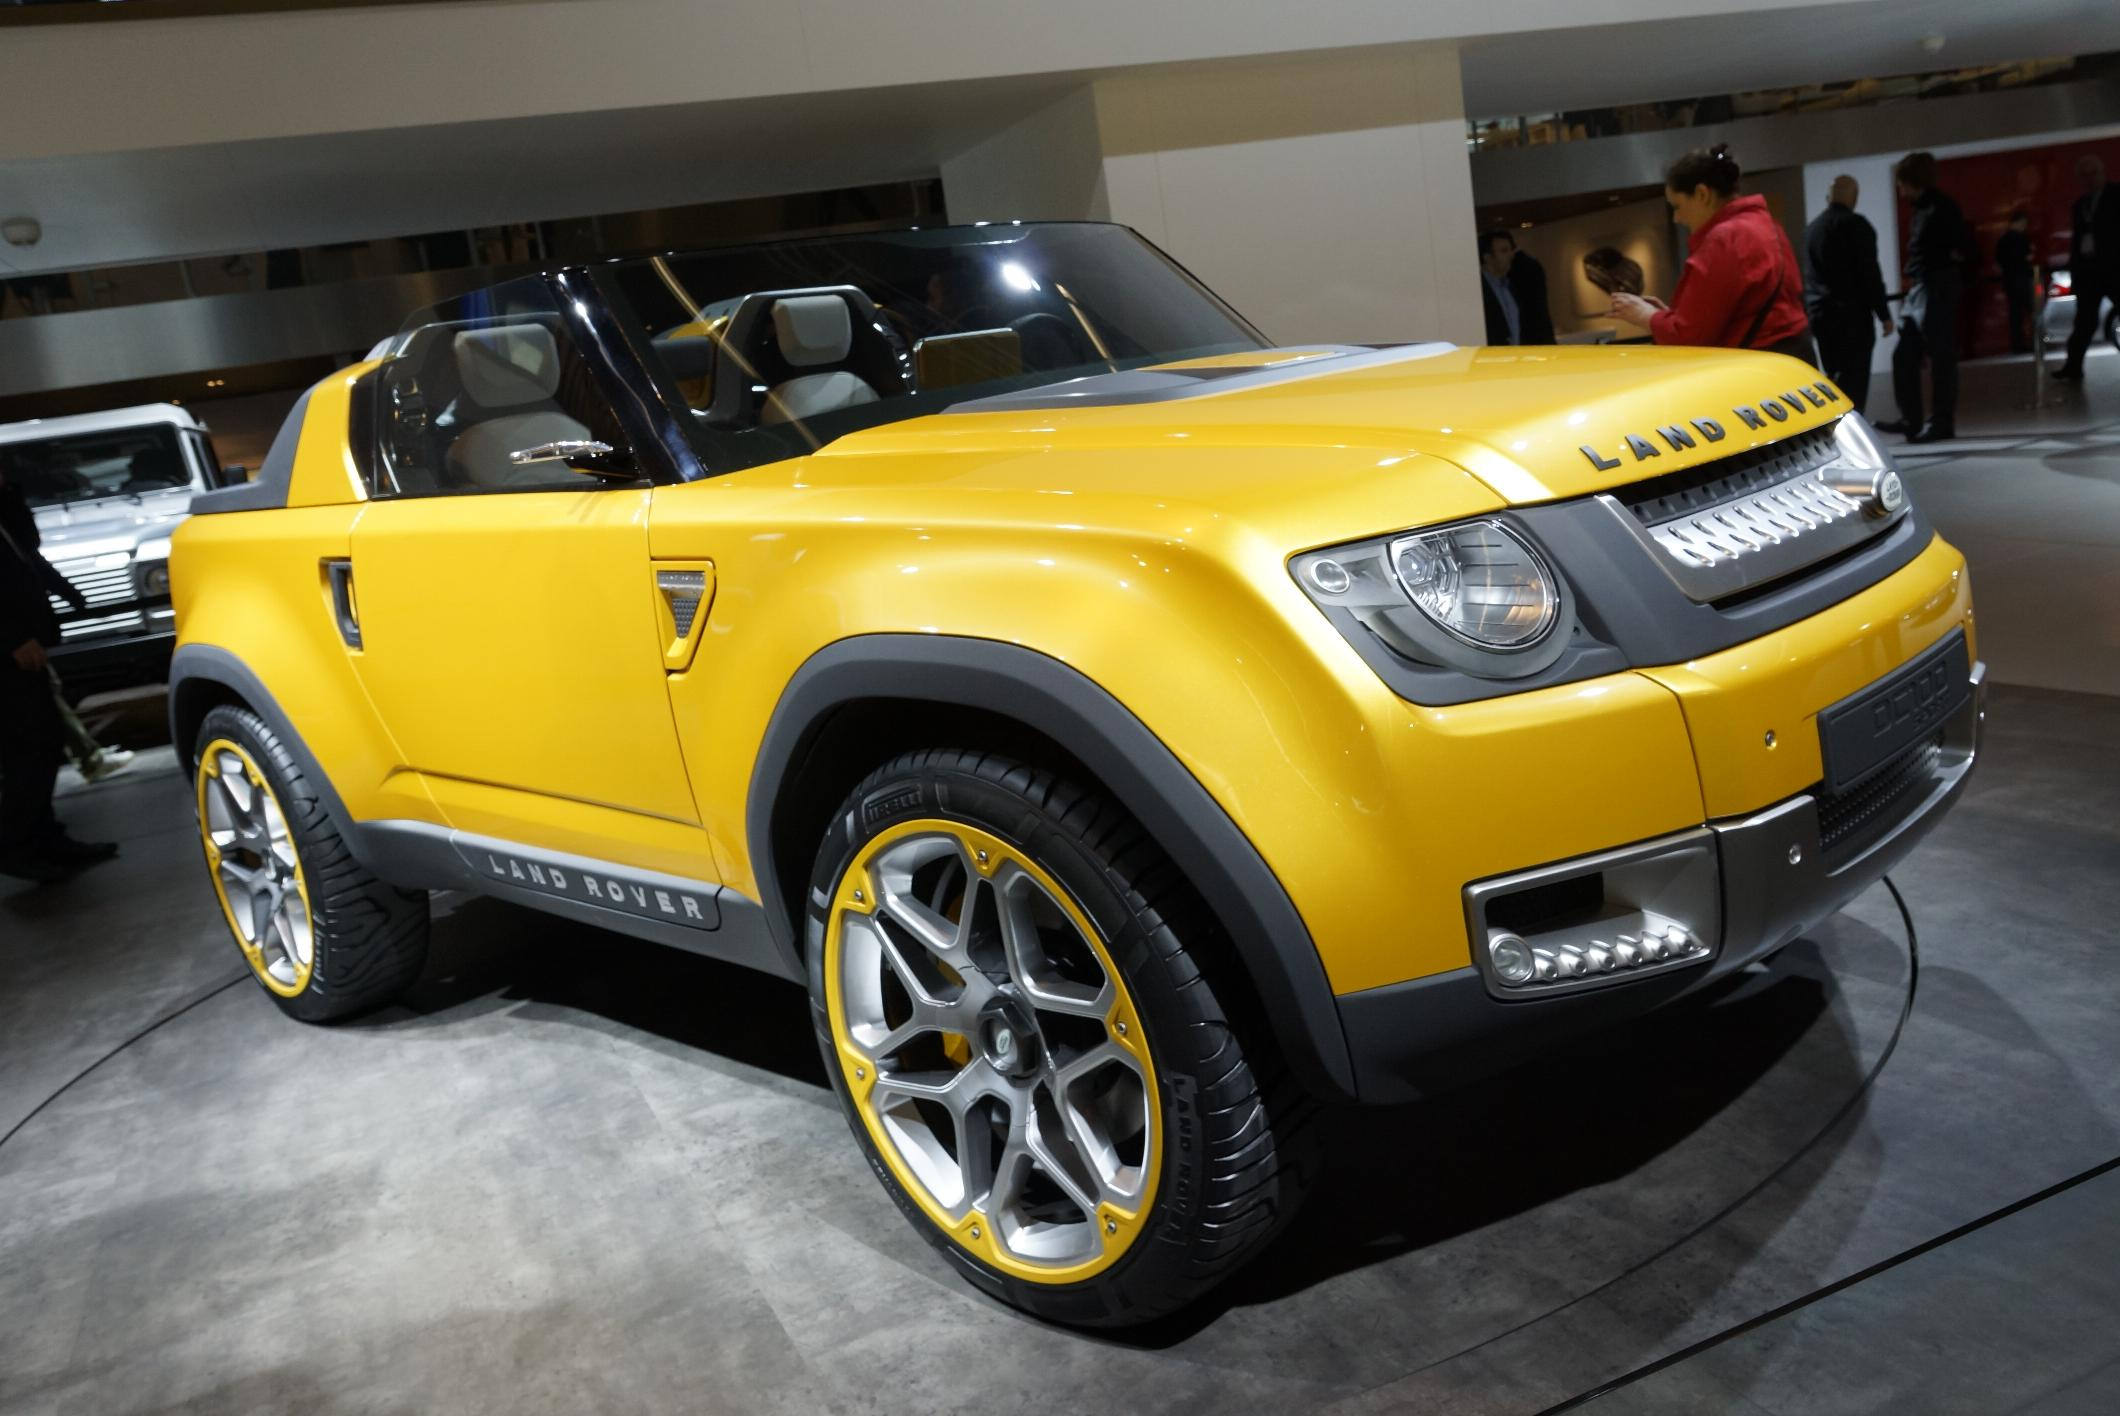 Land Rover Dc100 Sport Price ✓ Land Rover Car